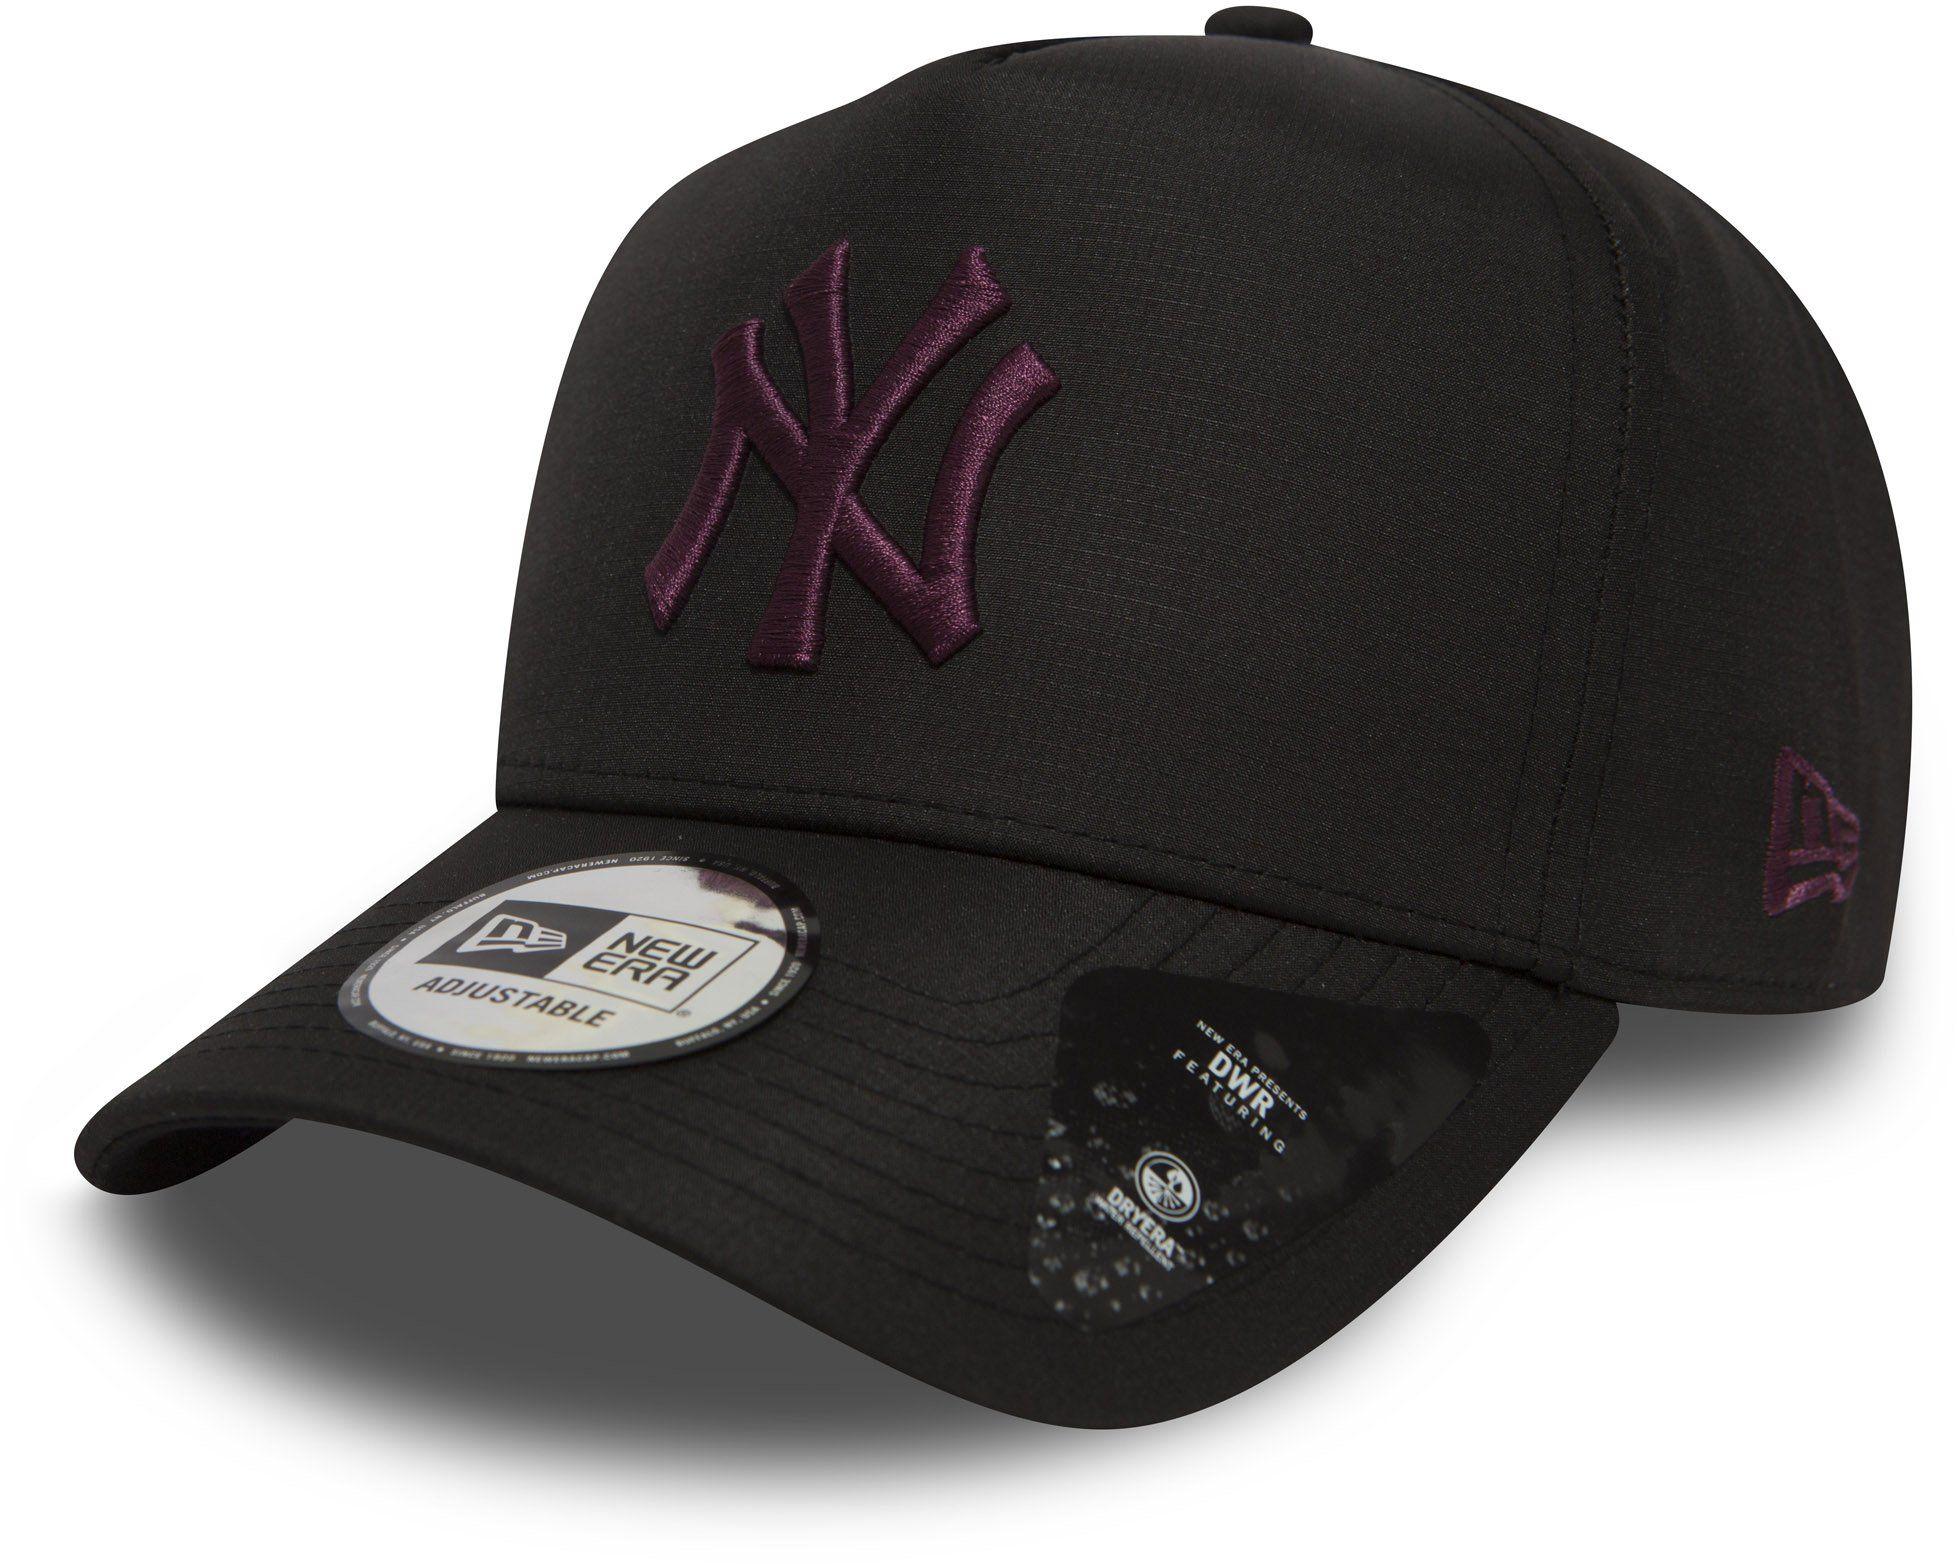 Ny Yankees New Era Ripstop A Frame Baseball Cap Lovemycap Yankees News Ny Yankees Mlb Baseball Caps